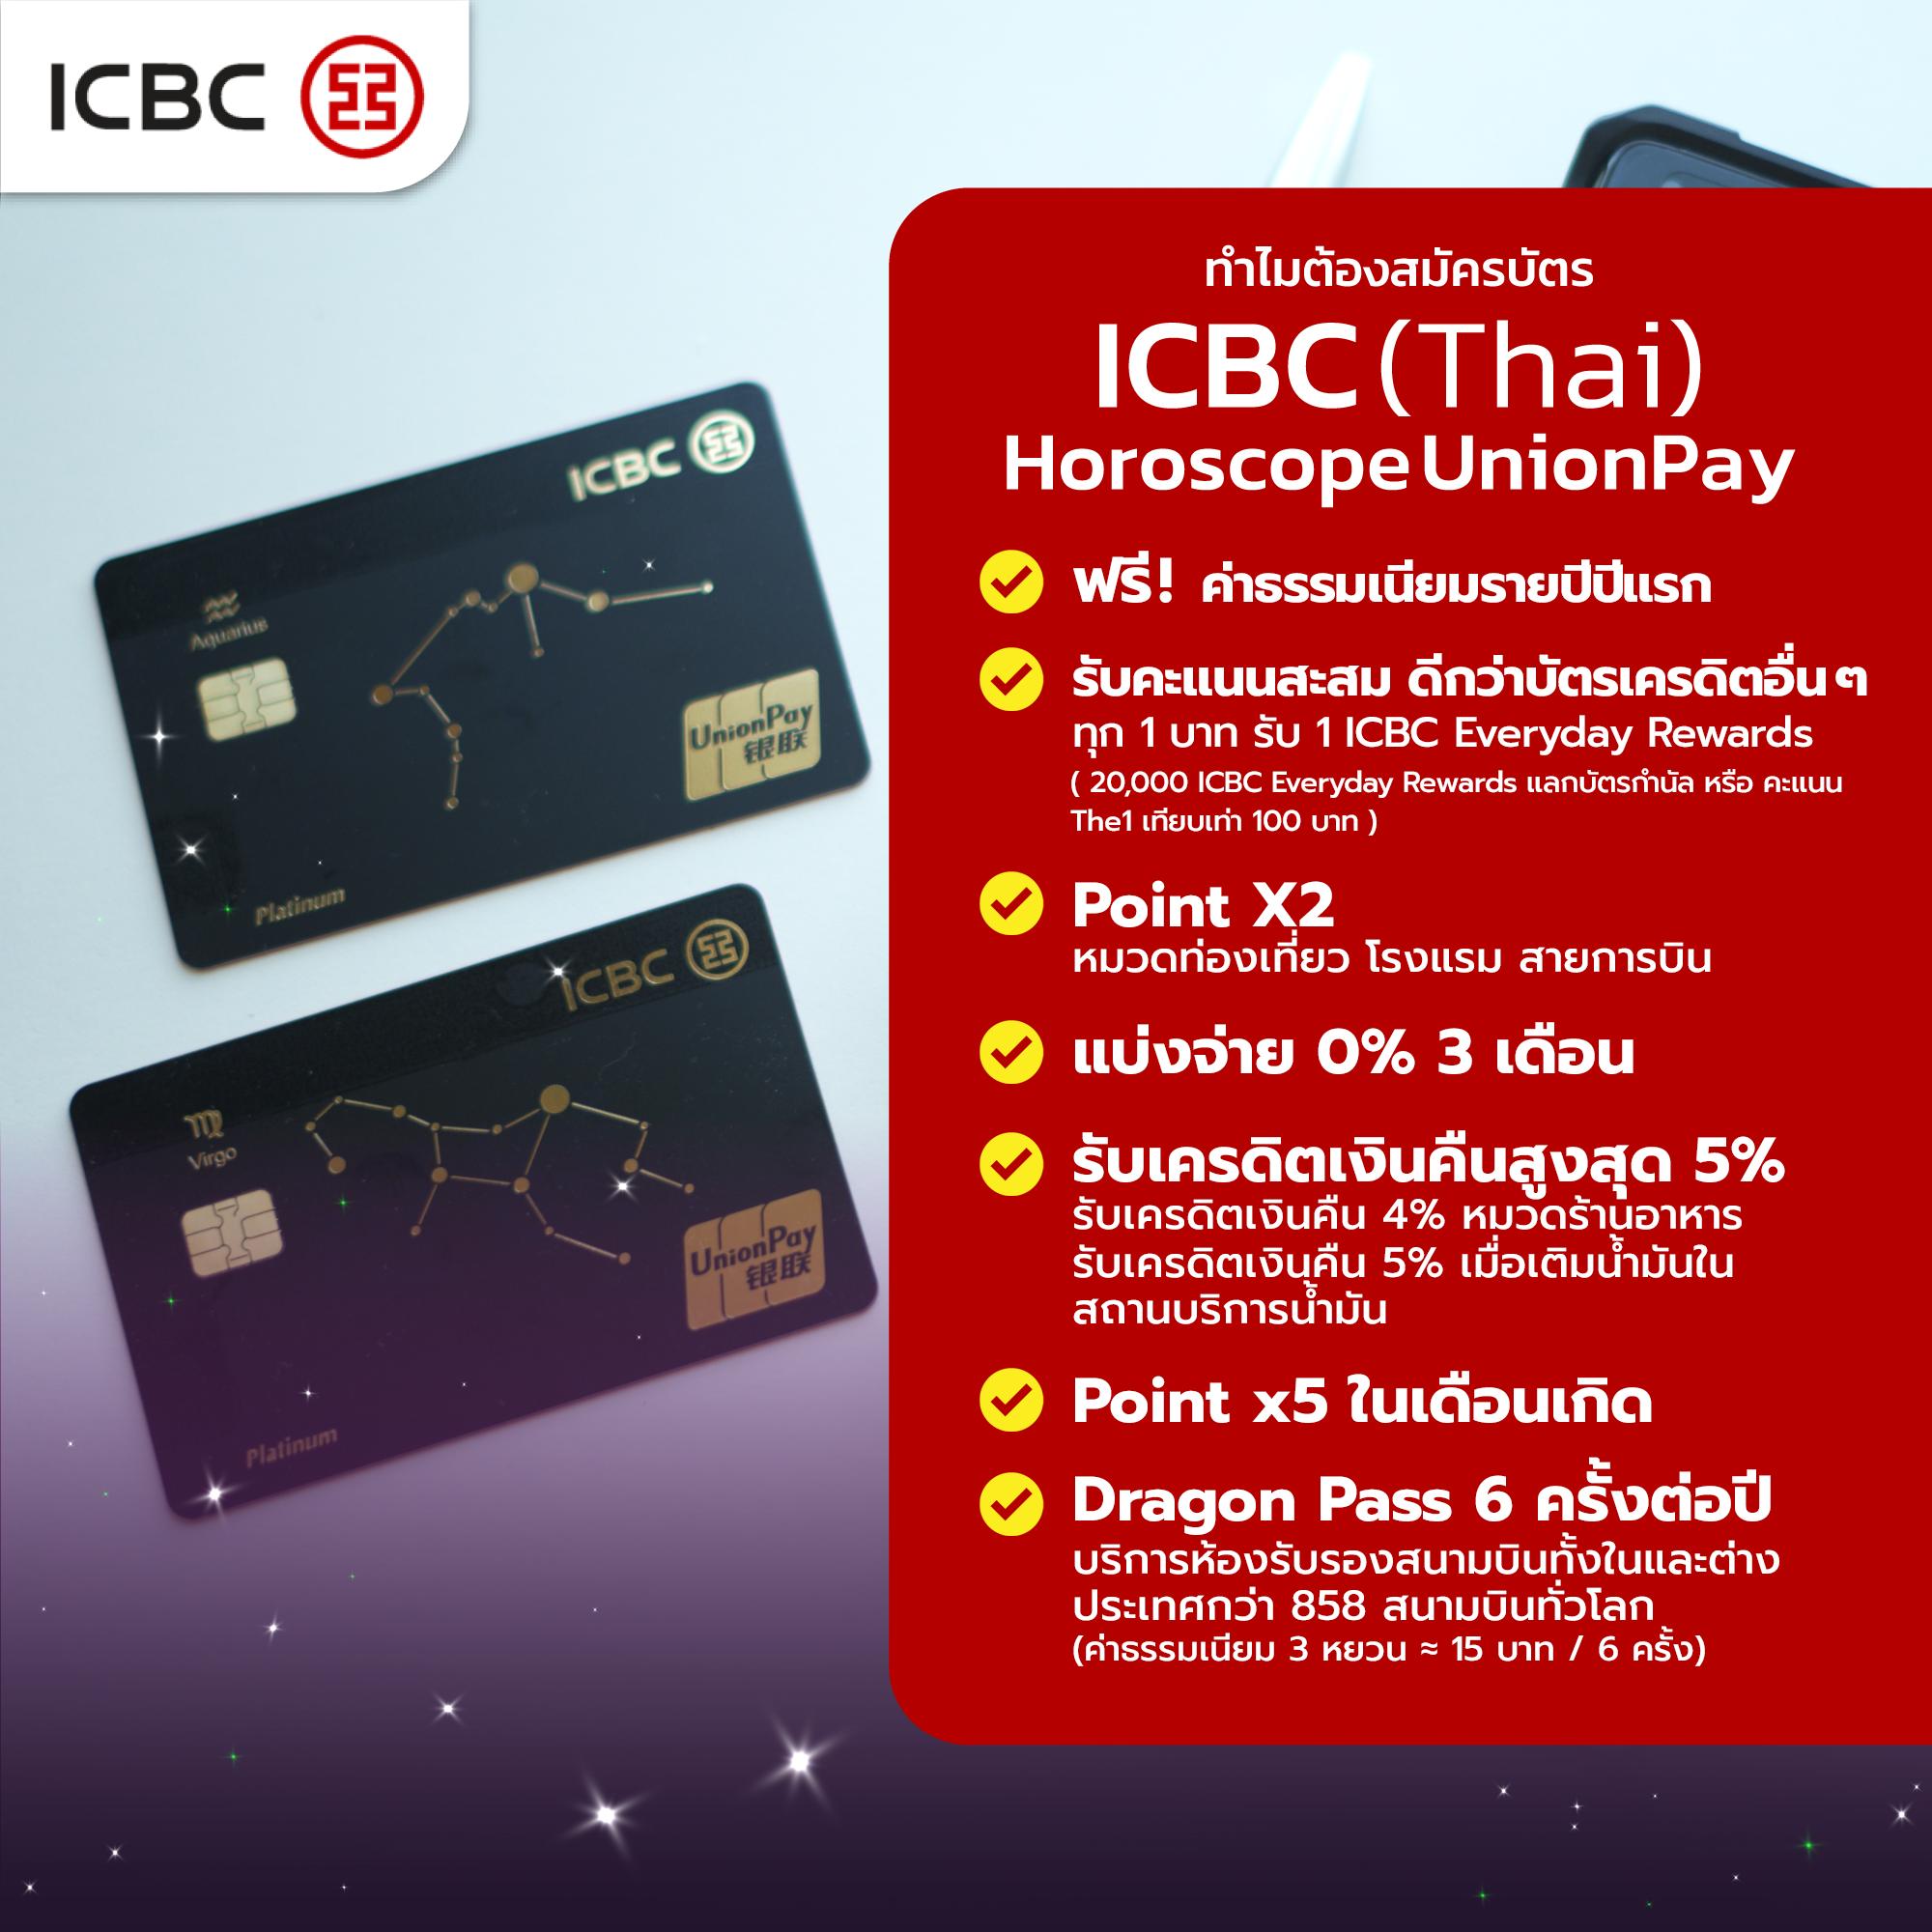 benefit-icbc-horoscope-unionpay